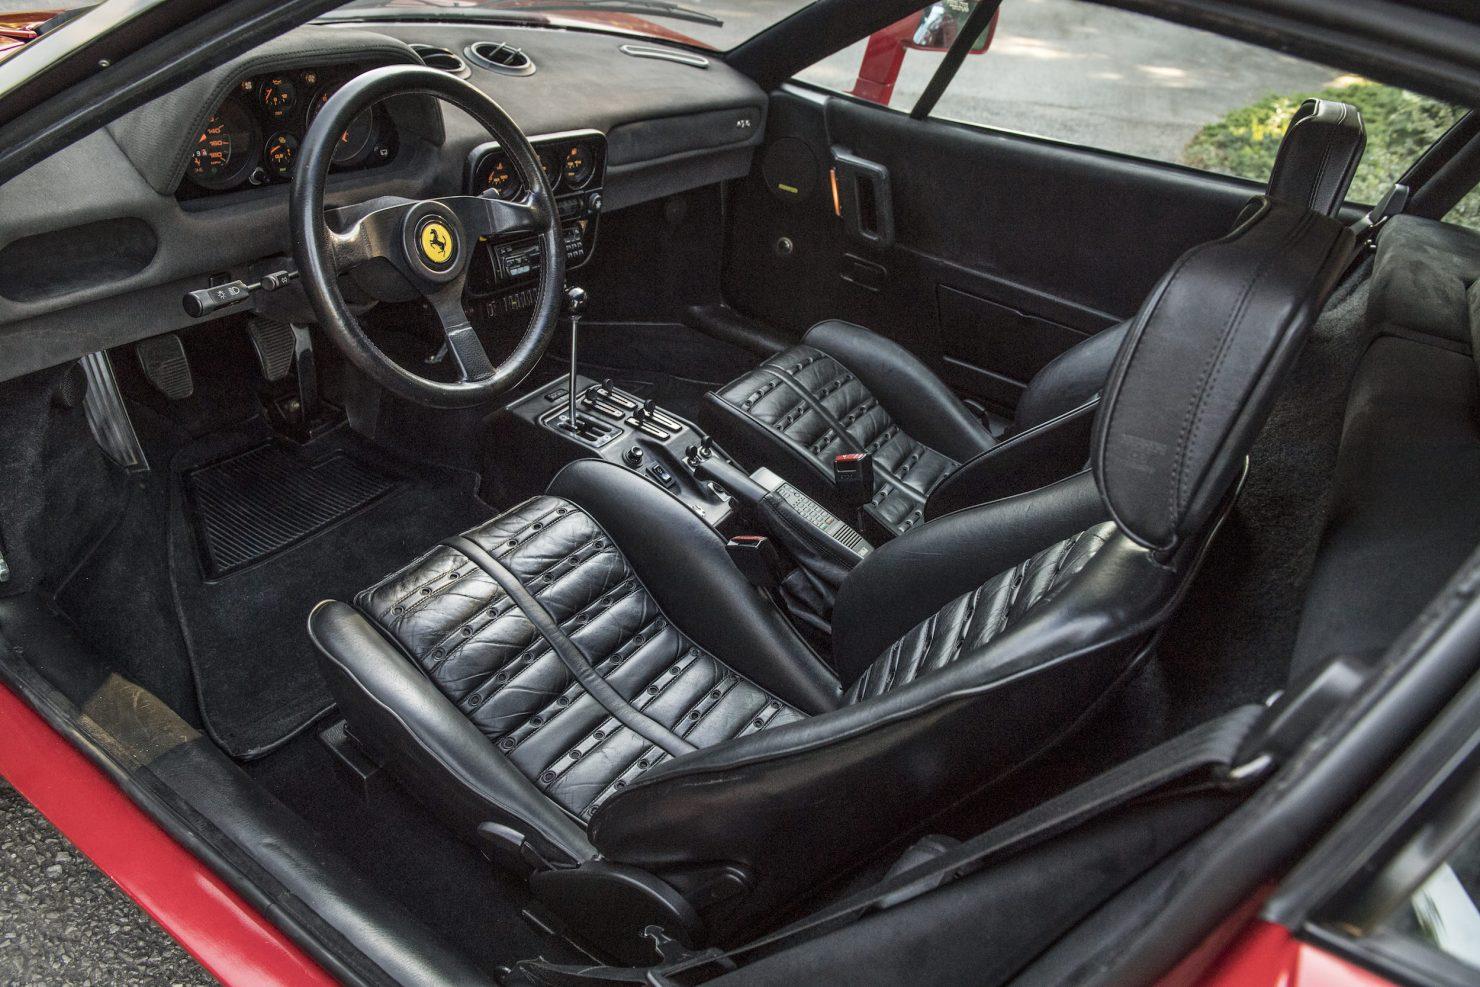 Ferrari 288 GTO 11 1480x987 - 1985 Ferrari 288 GTO